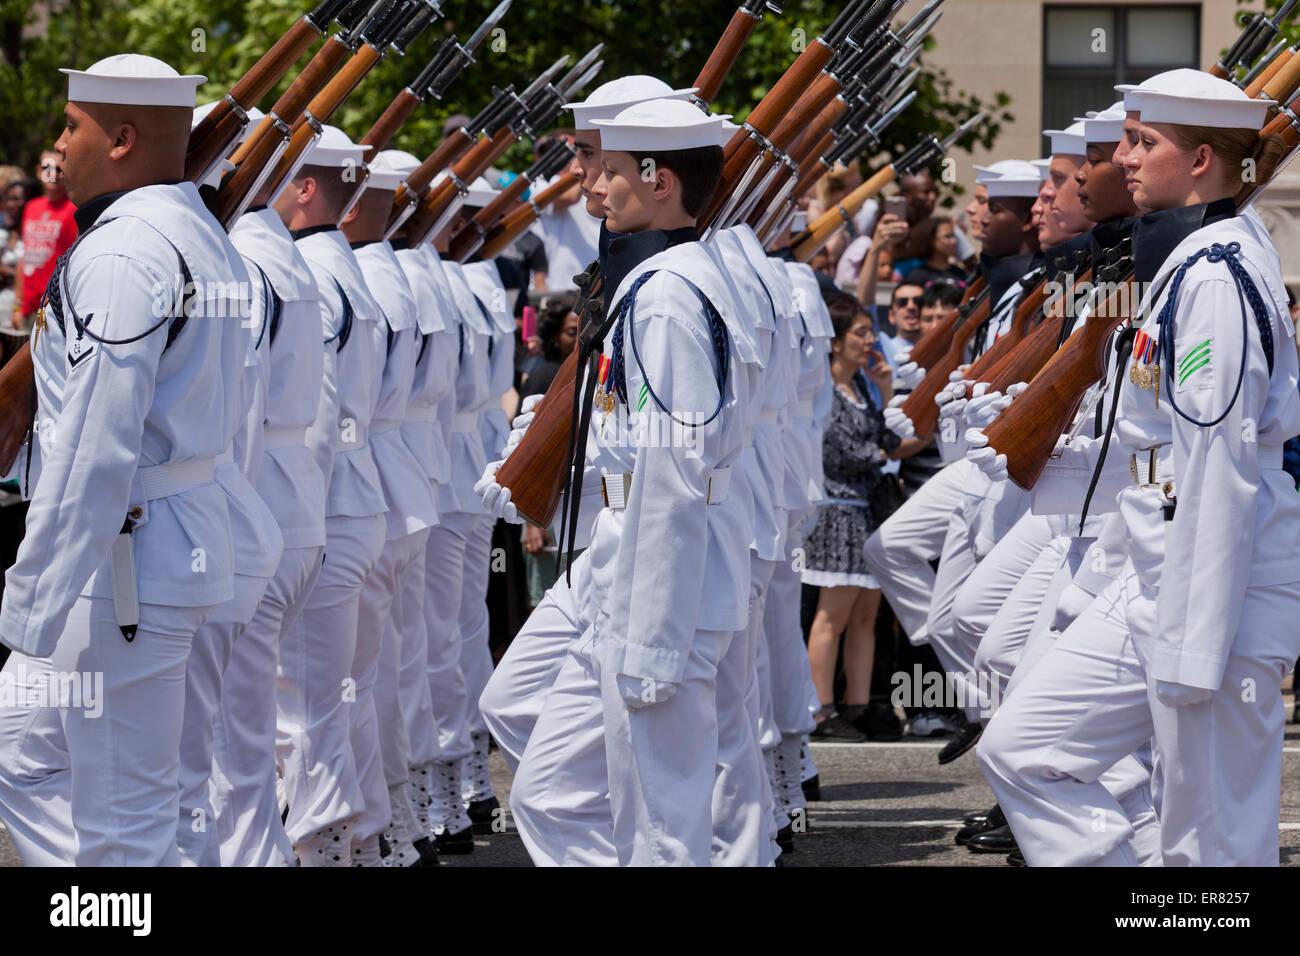 Us Navy Ceremonial Guard Drill Team Marching In Memorial Day - Us-navy-ceremonial-guard